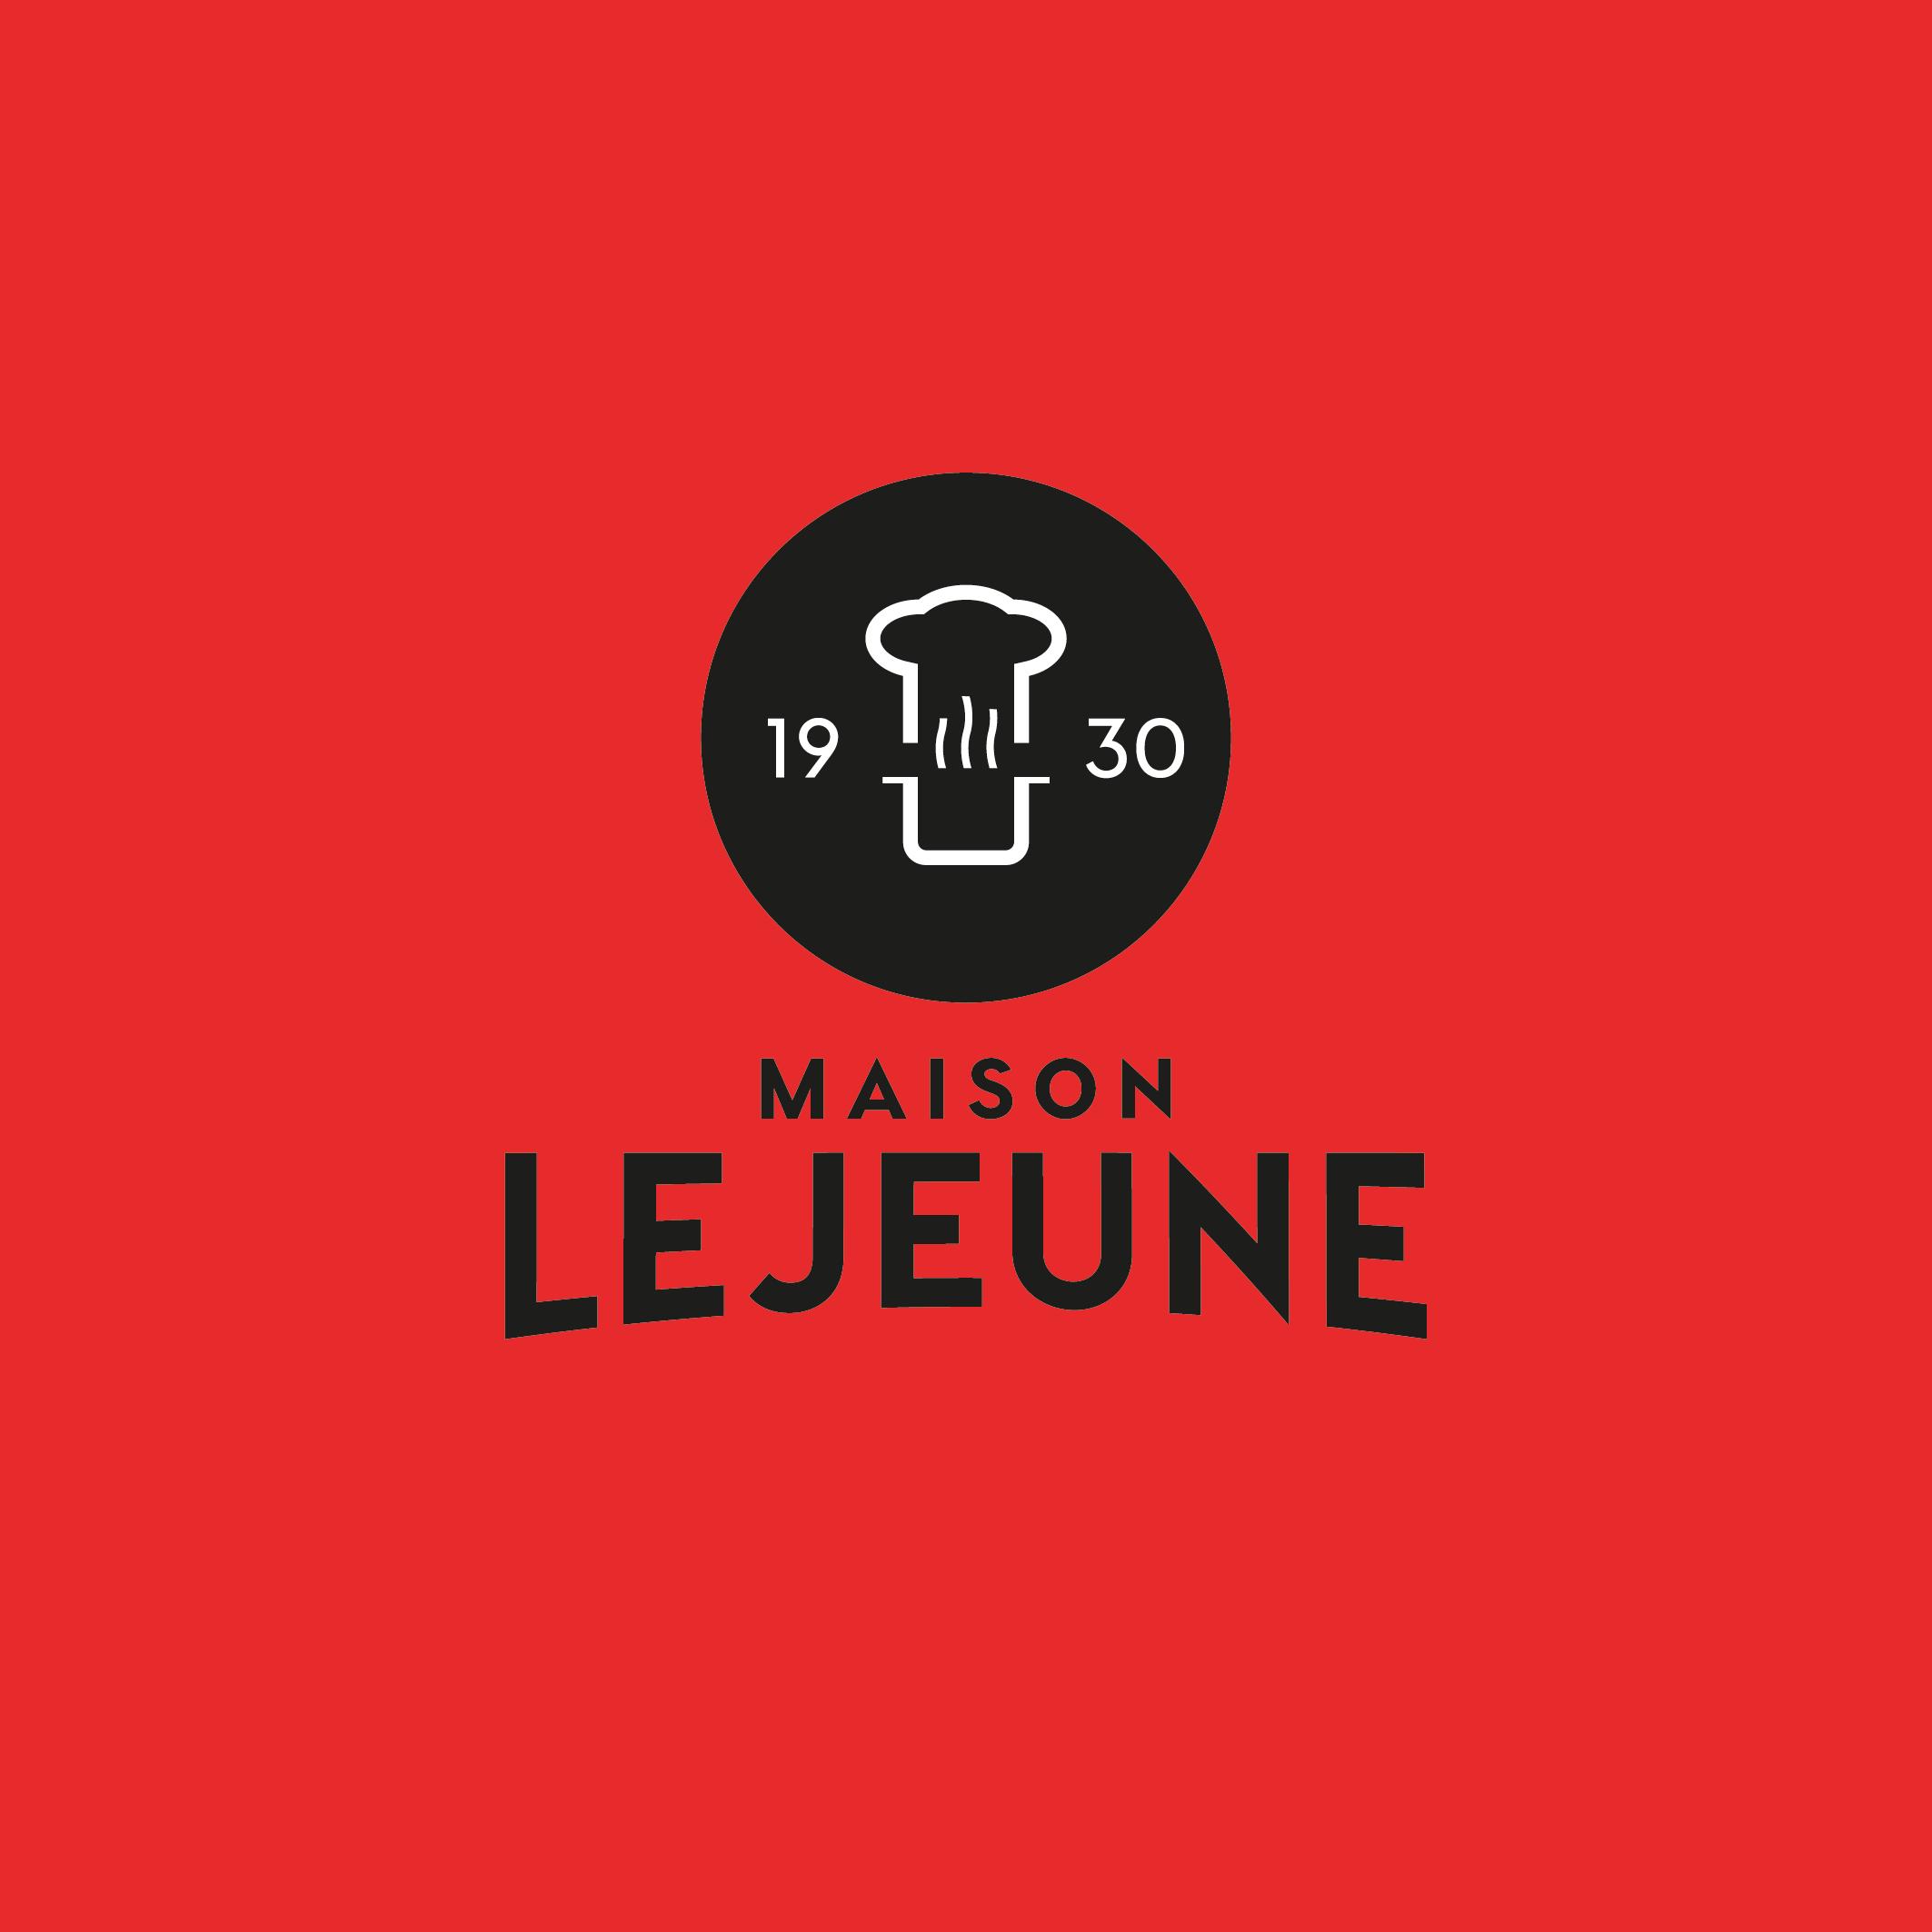 Maison Lejeune logo